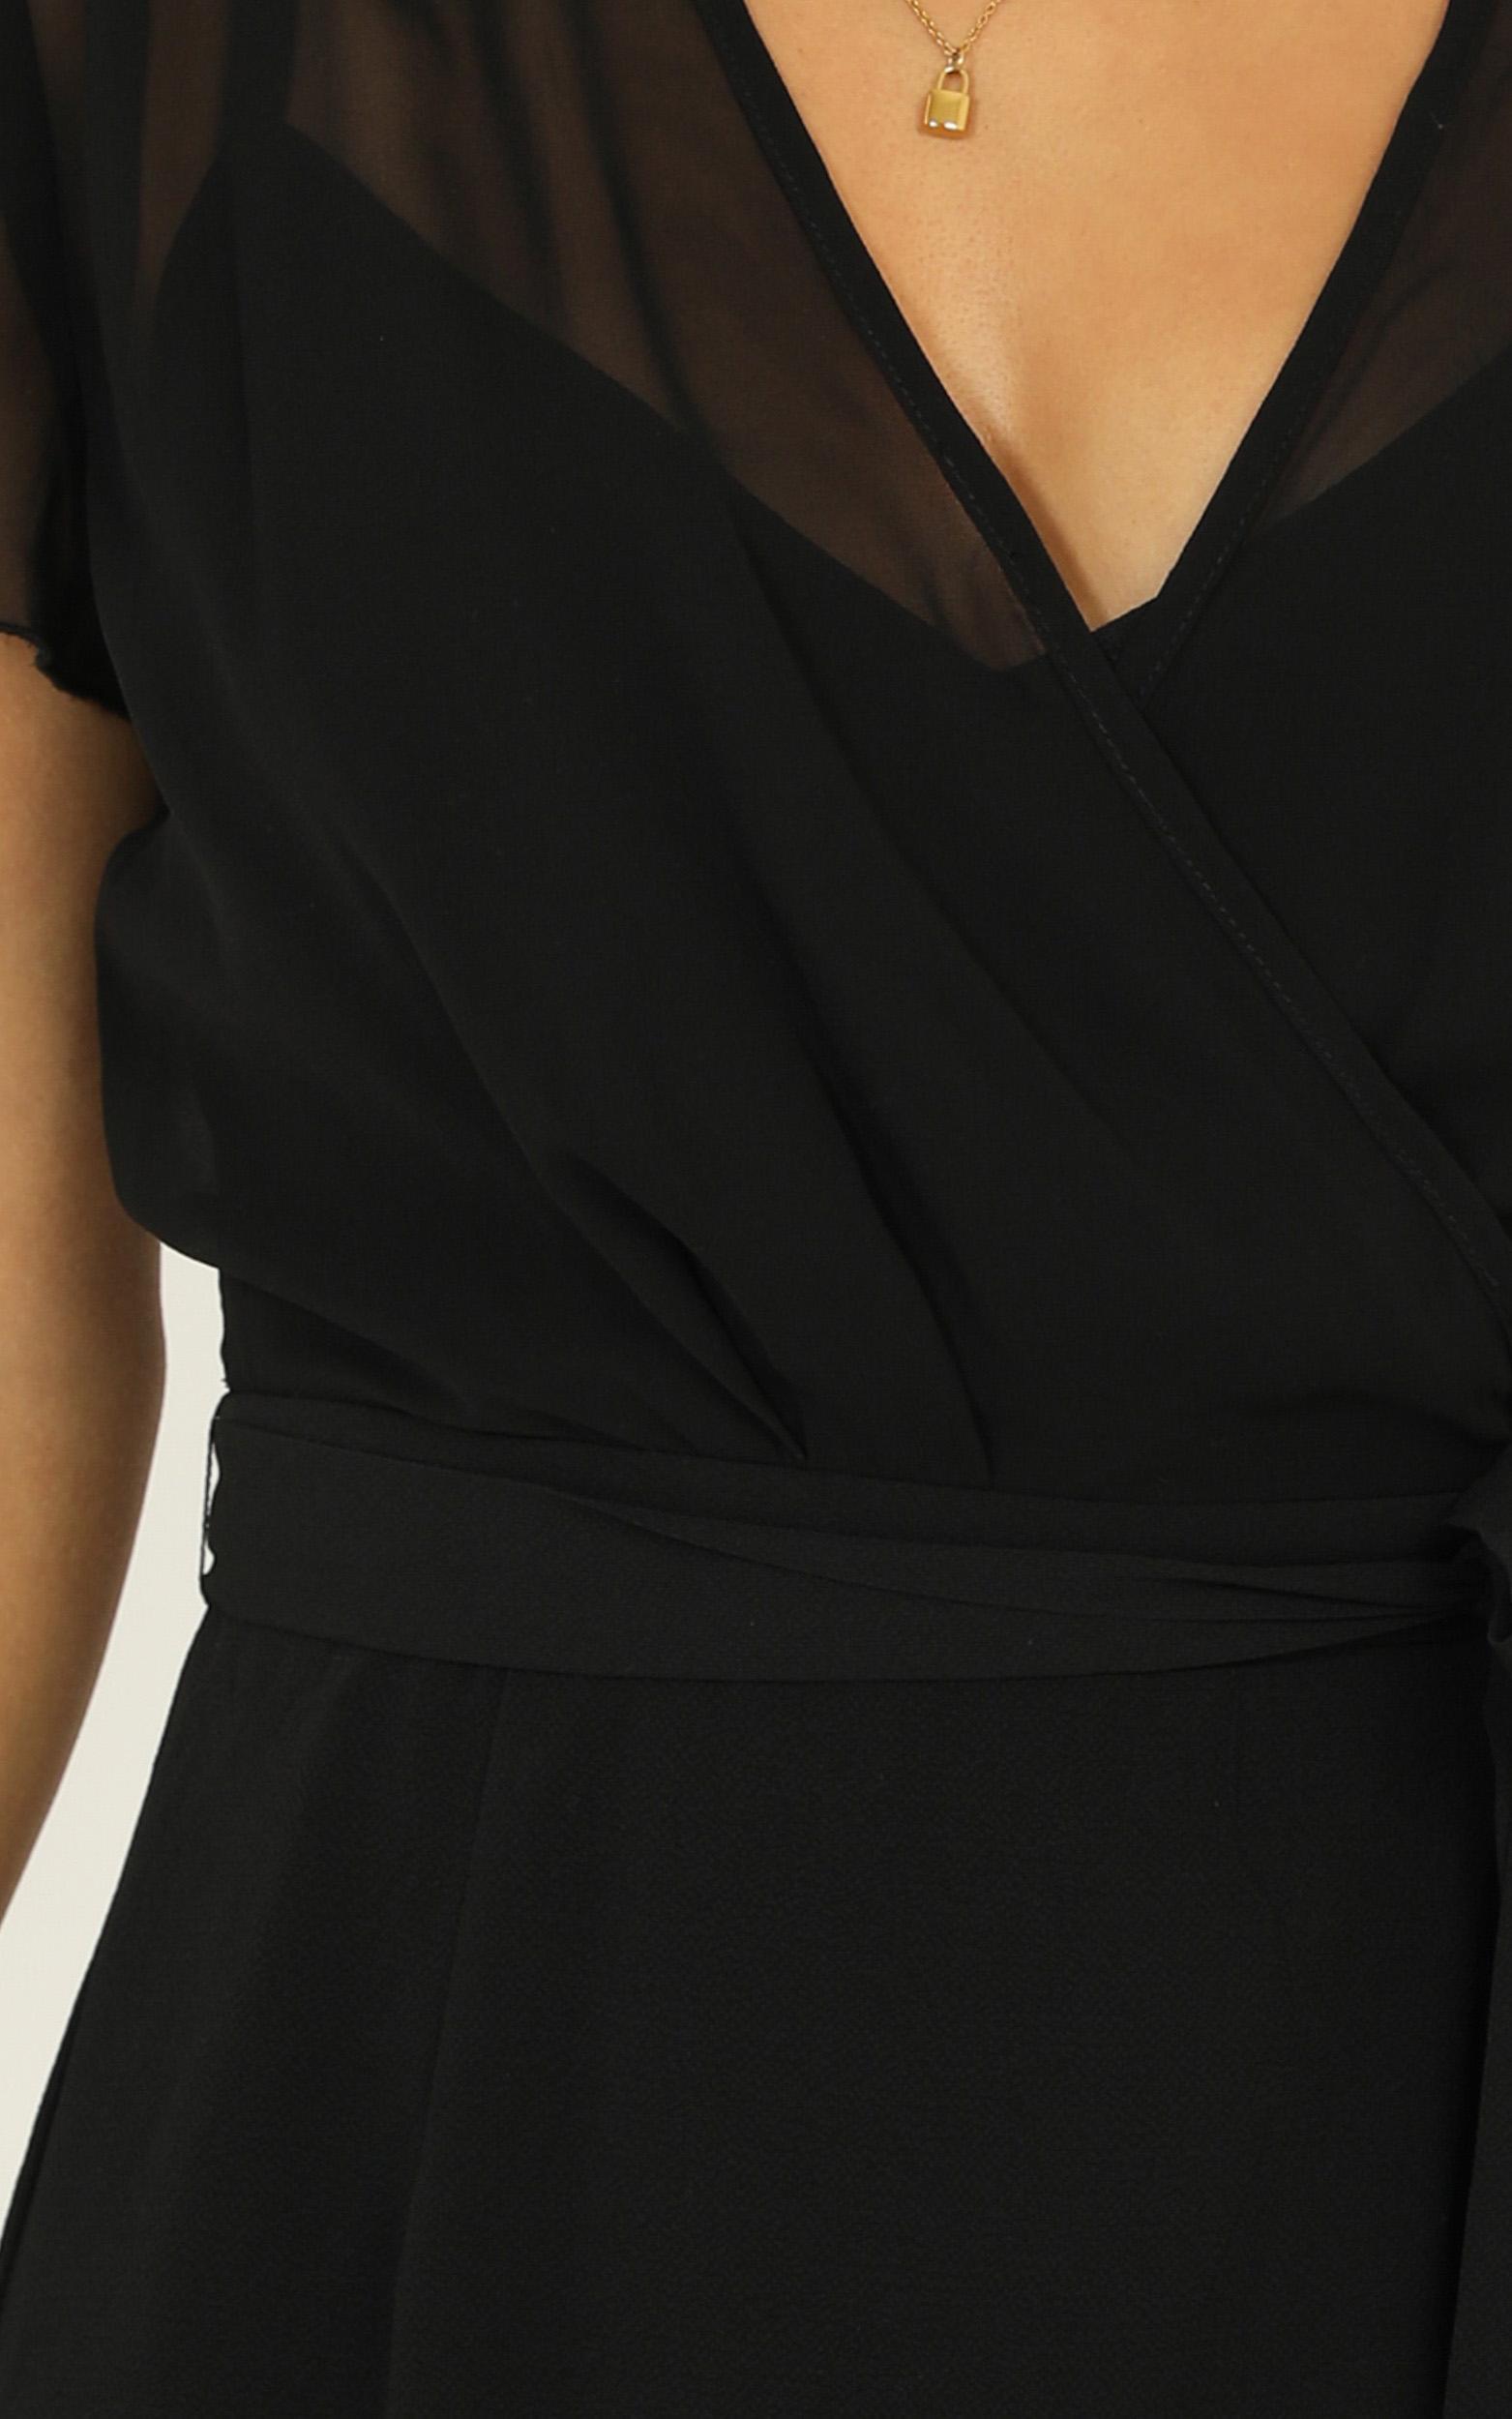 Kicking Goals Dress in black - 20 (XXXXL), Black, hi-res image number null